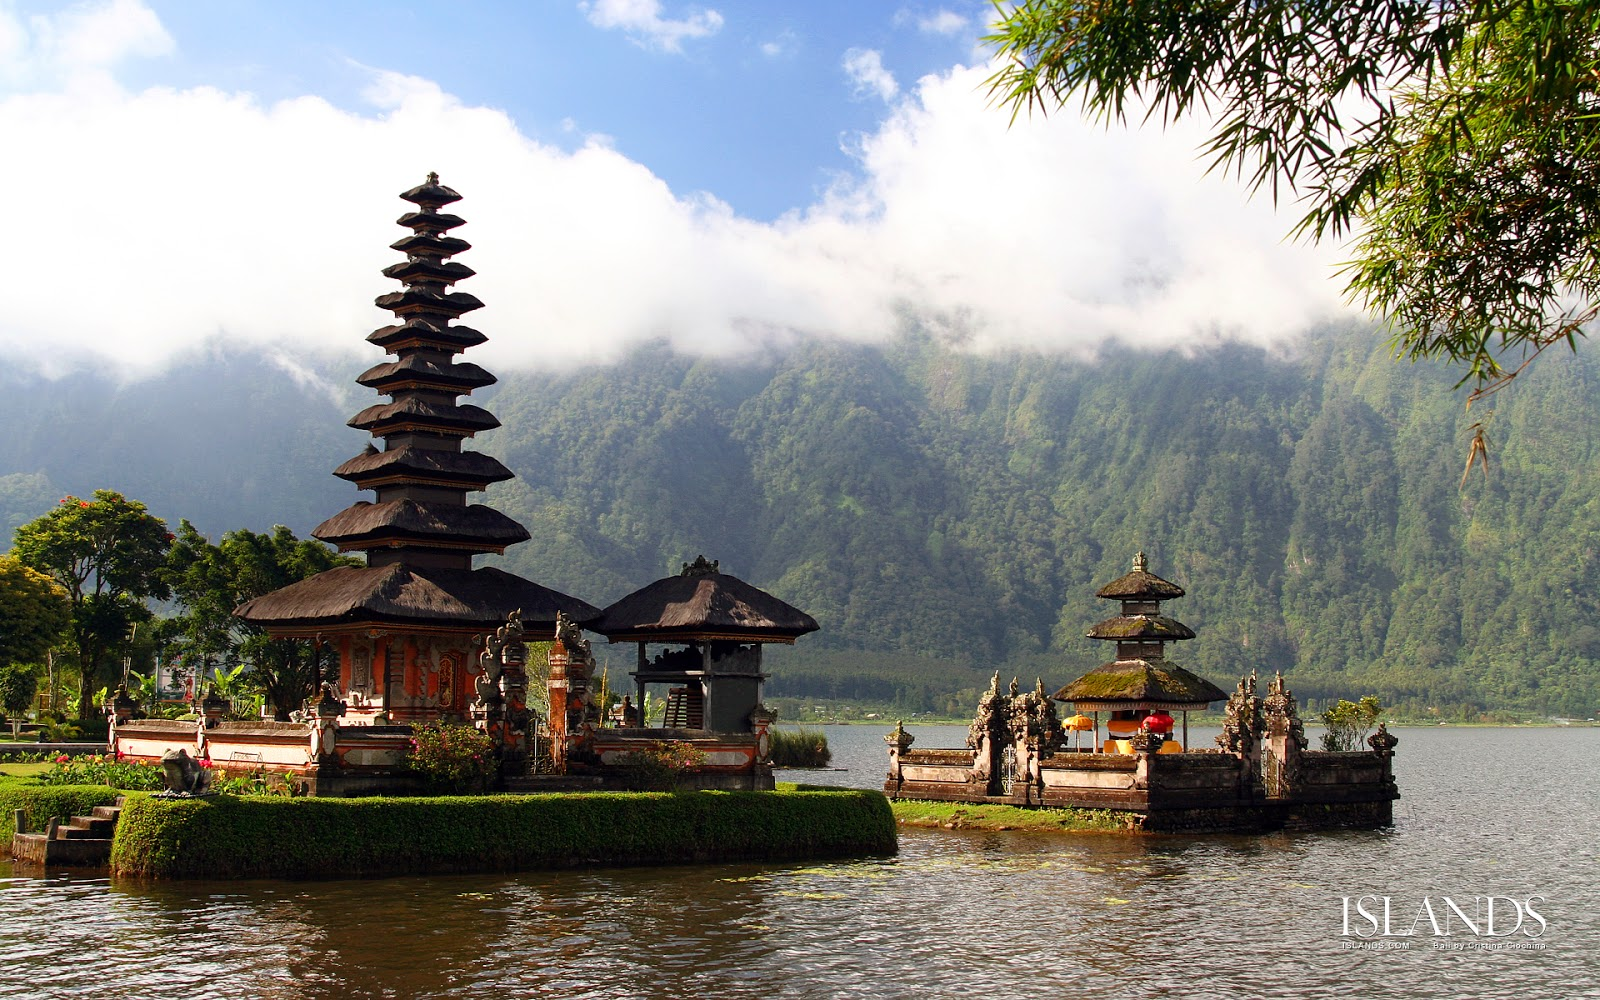 Free Download Windows 8 Themes: Bali Island Theme